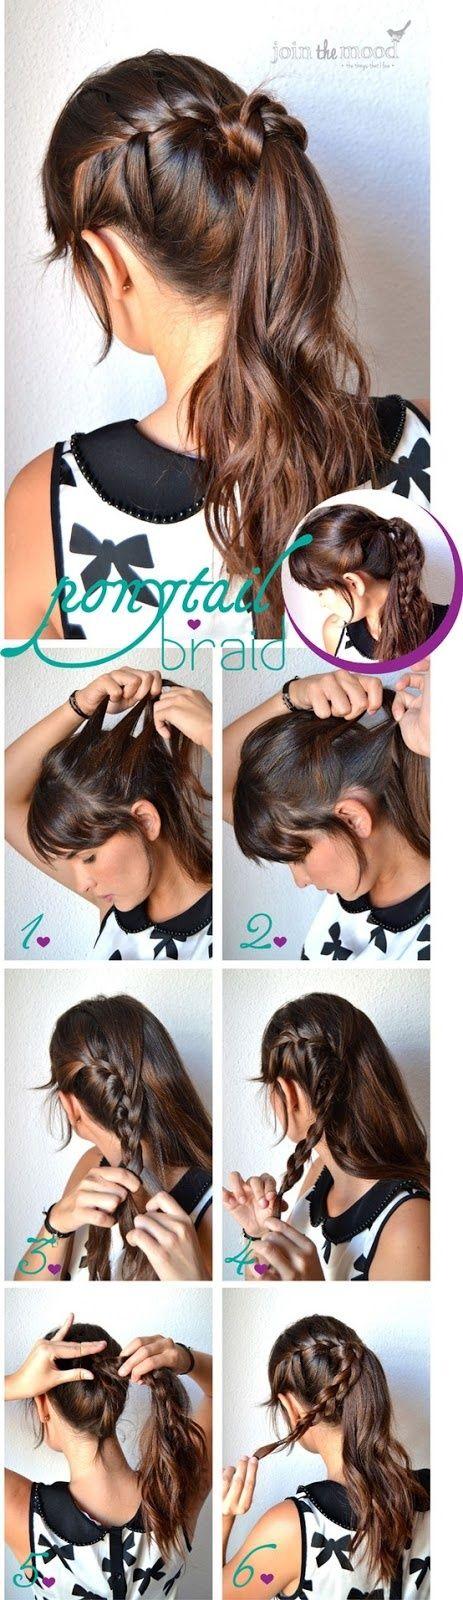 ponytail braid hair tutorial | Shes Beautiful